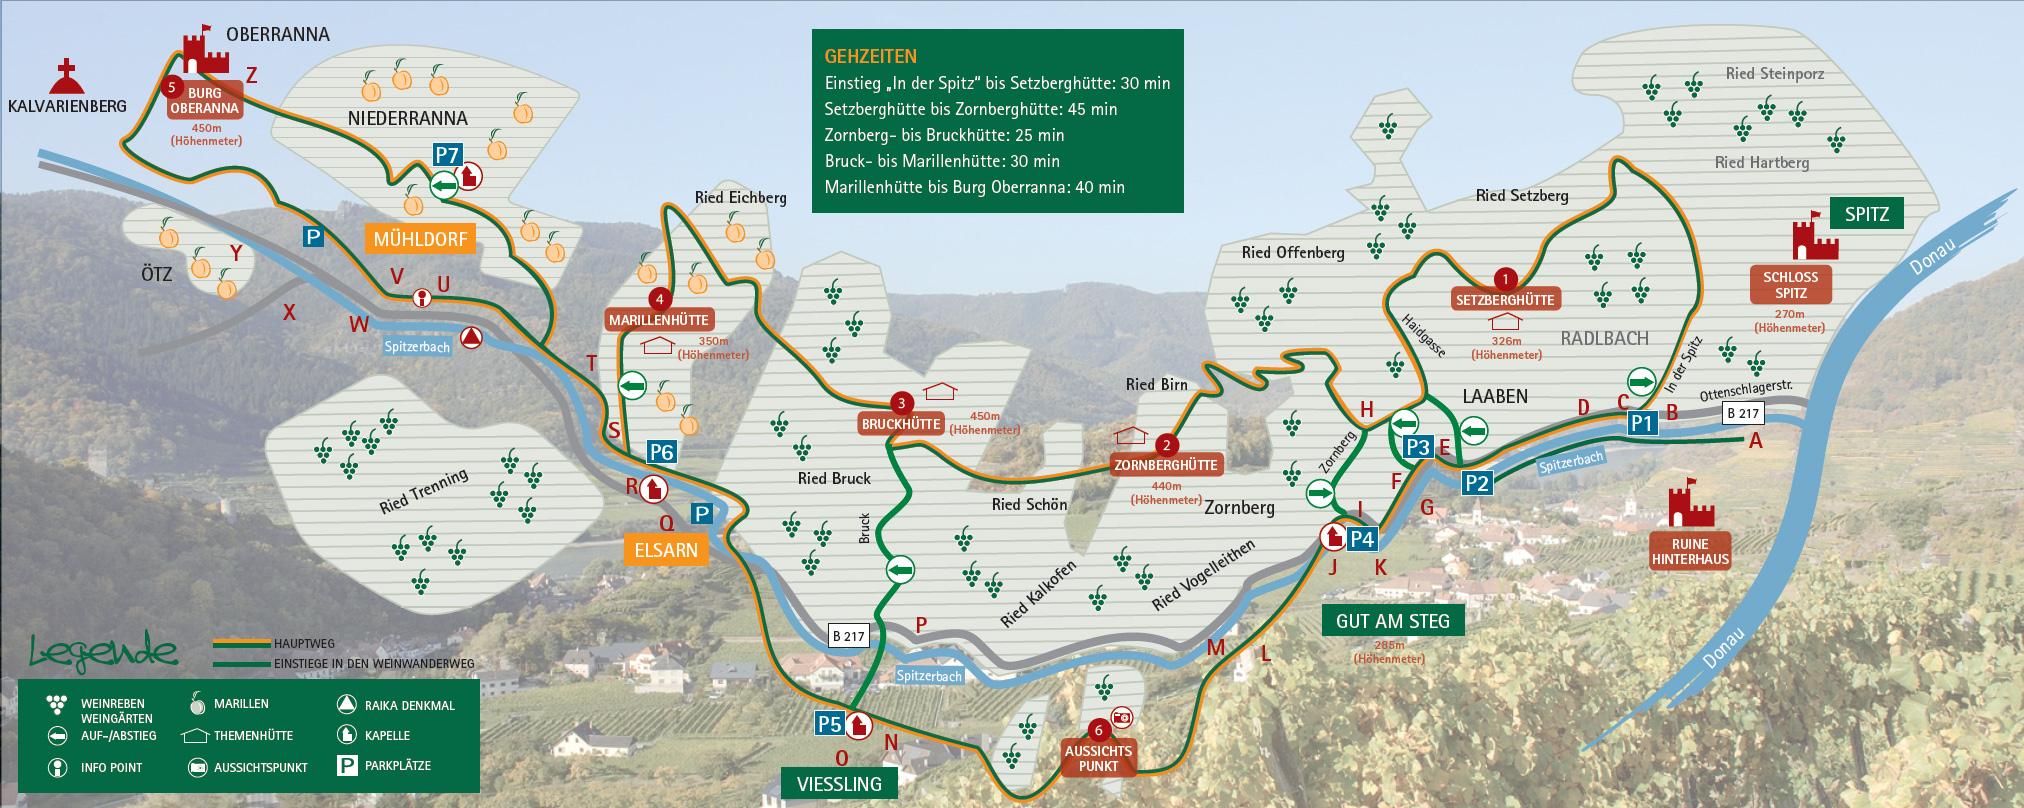 Wachau Karte Donau.Wachau Infos